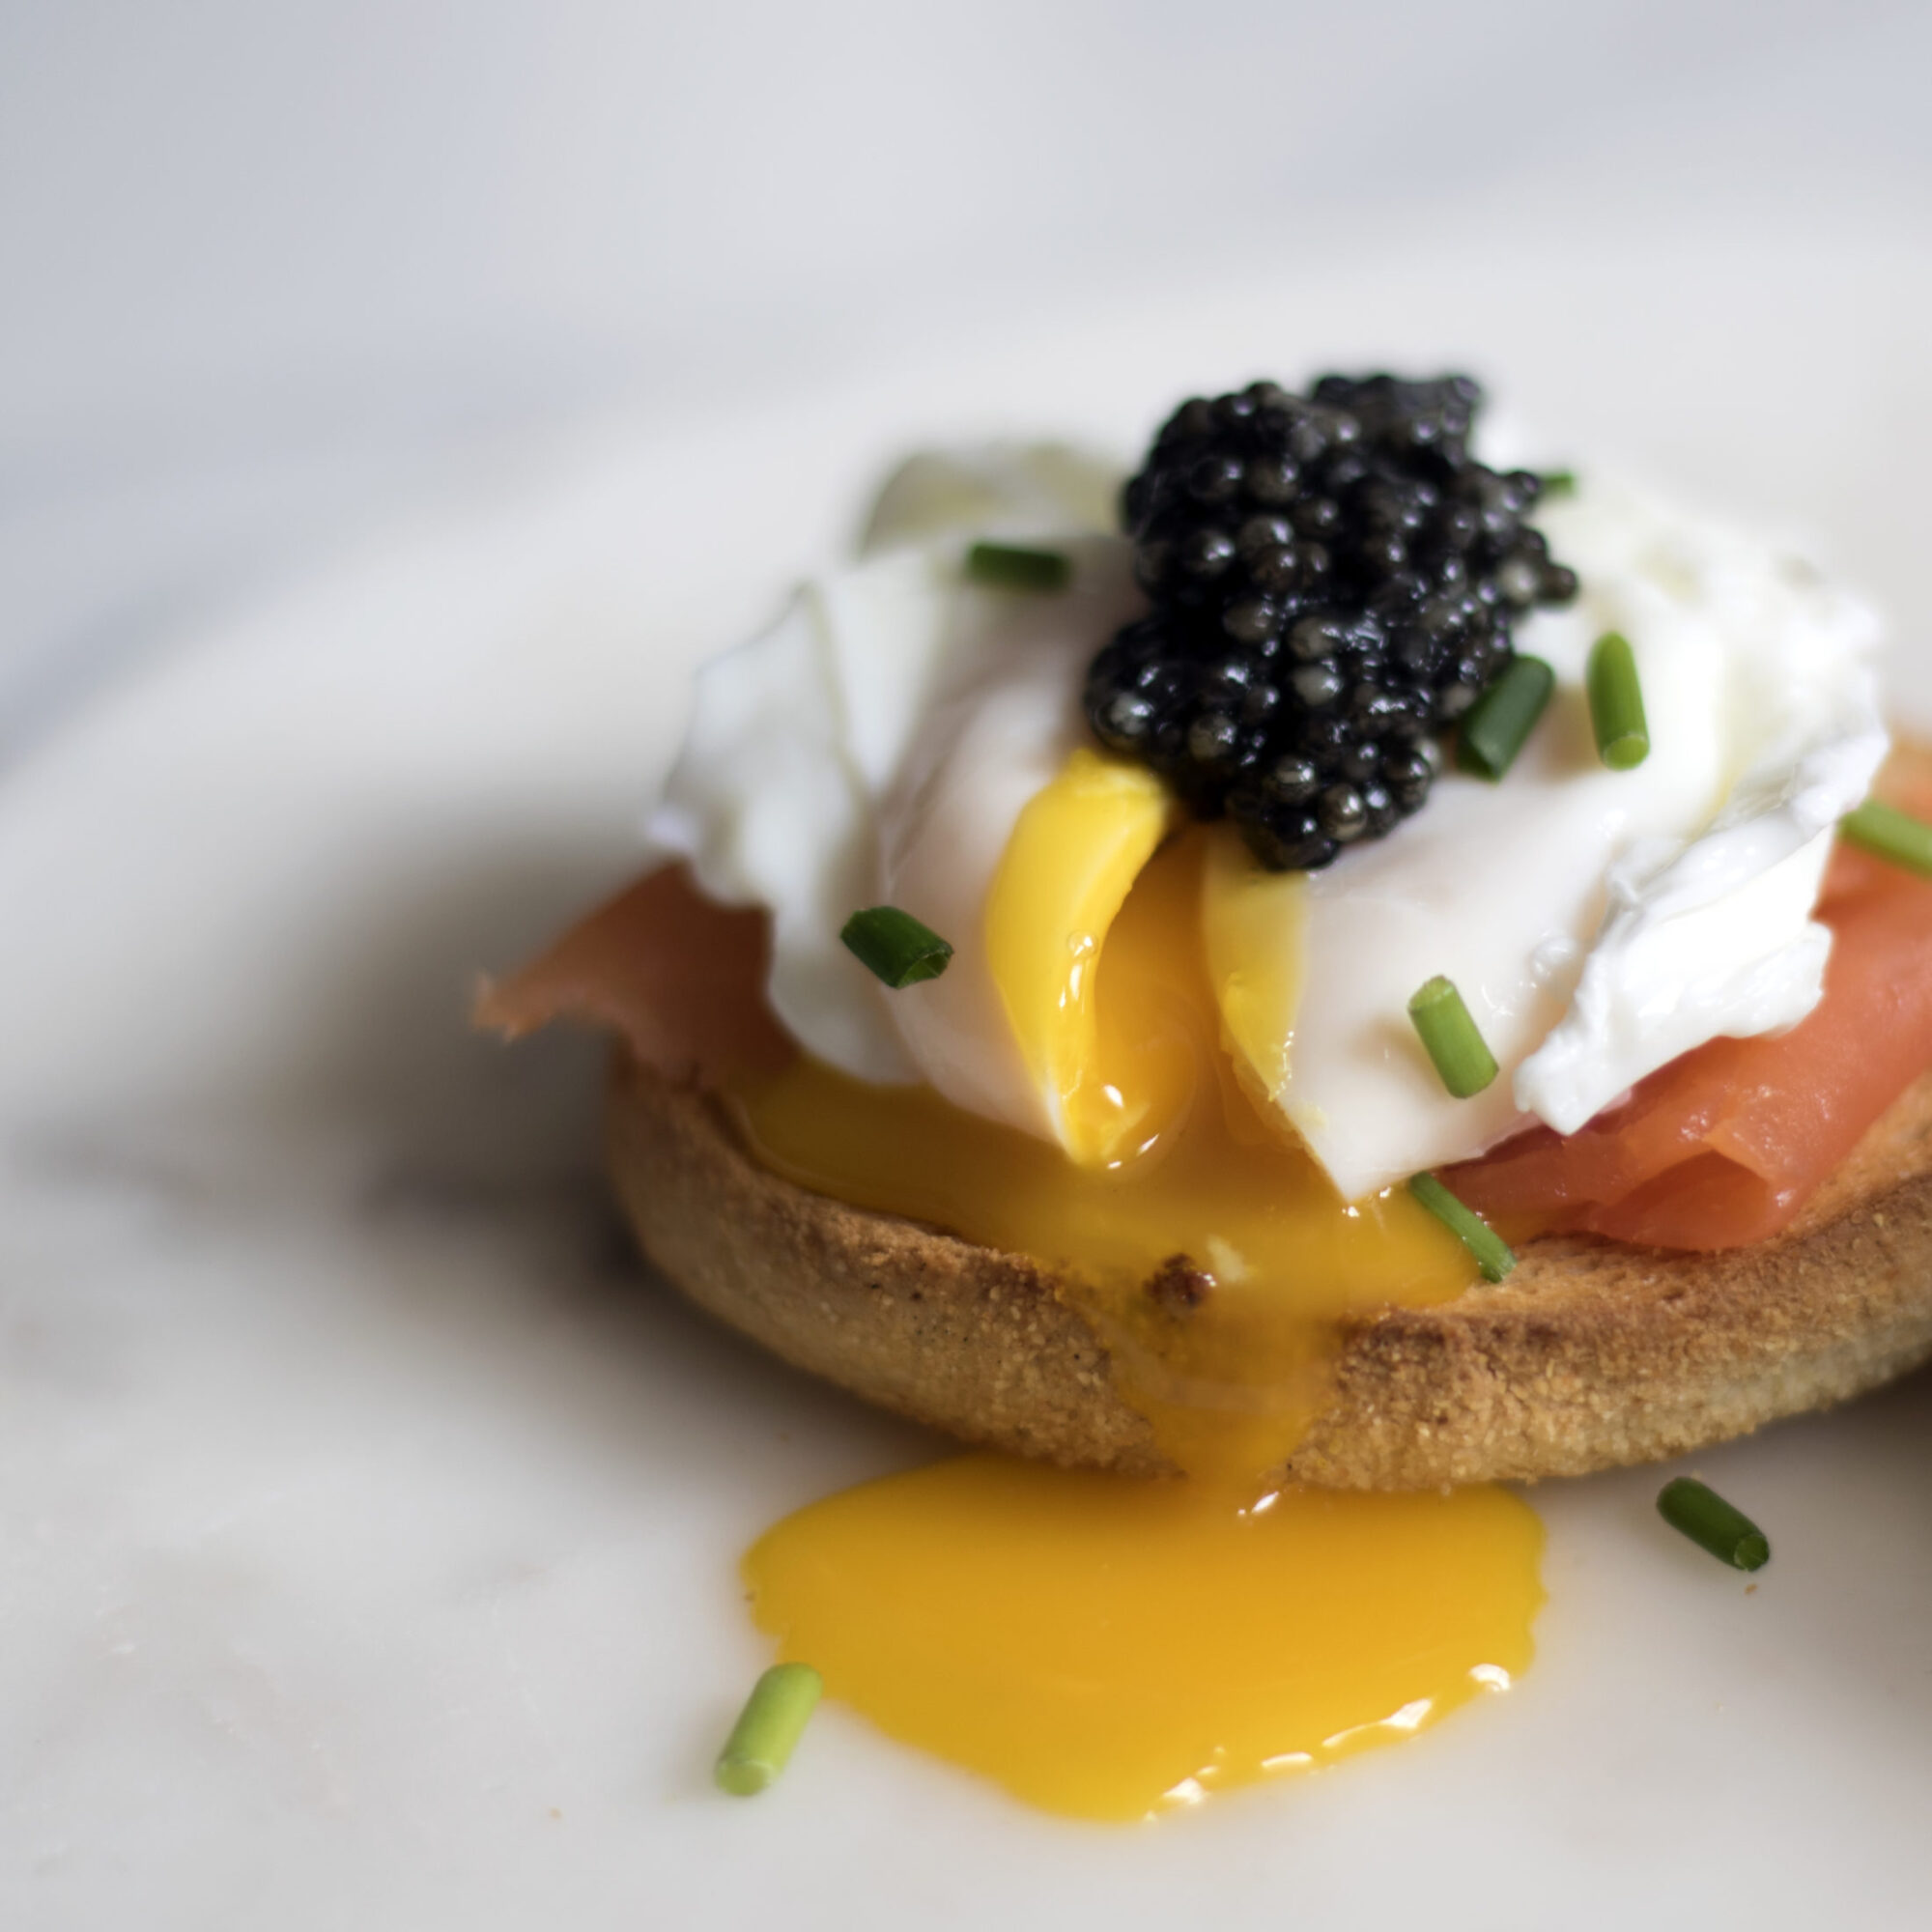 black caviar london